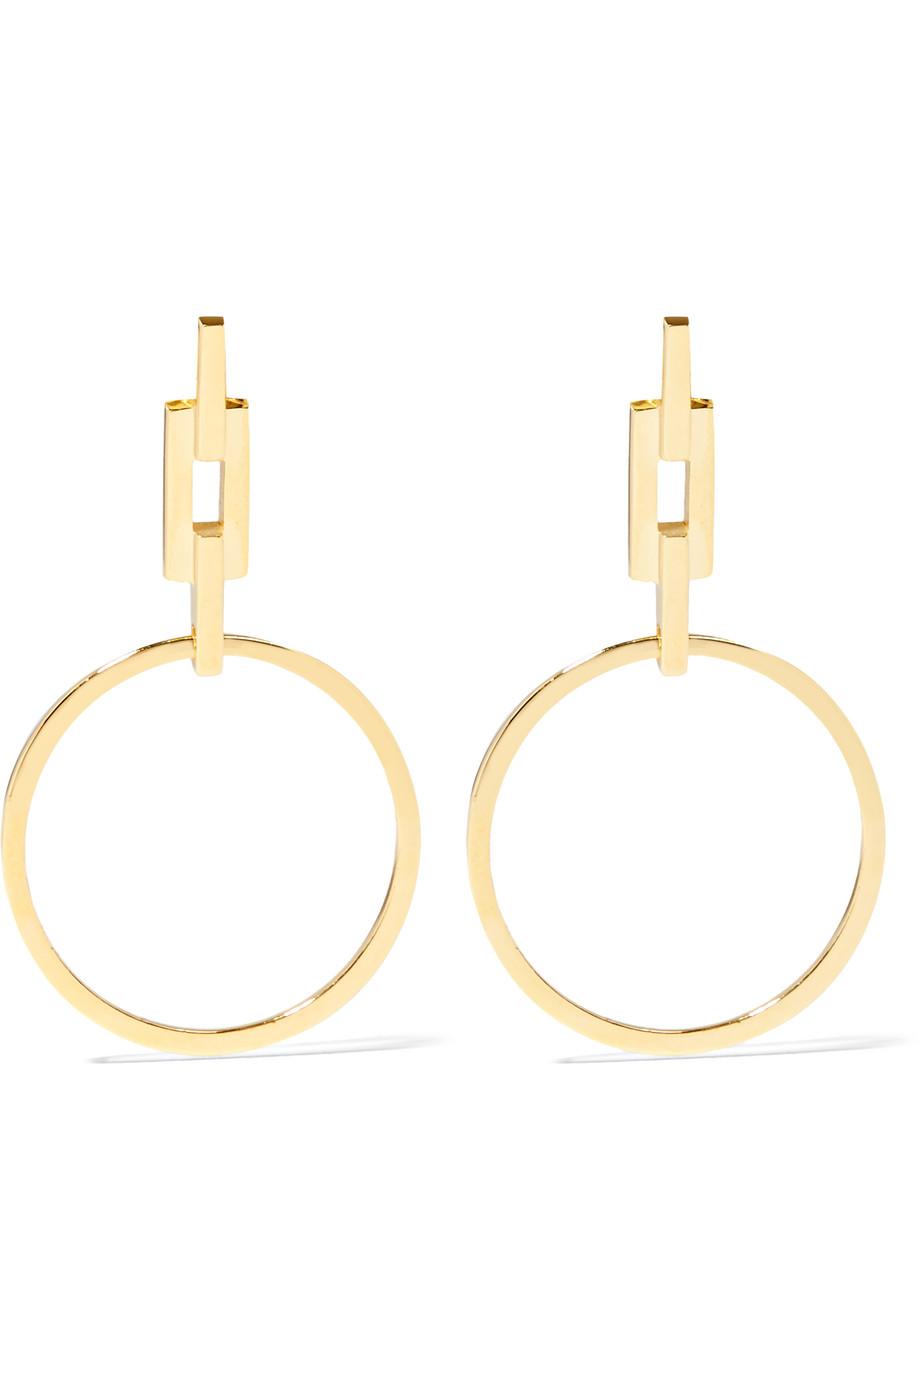 Maria Black Auro Gold-Plated Earrings, Women's